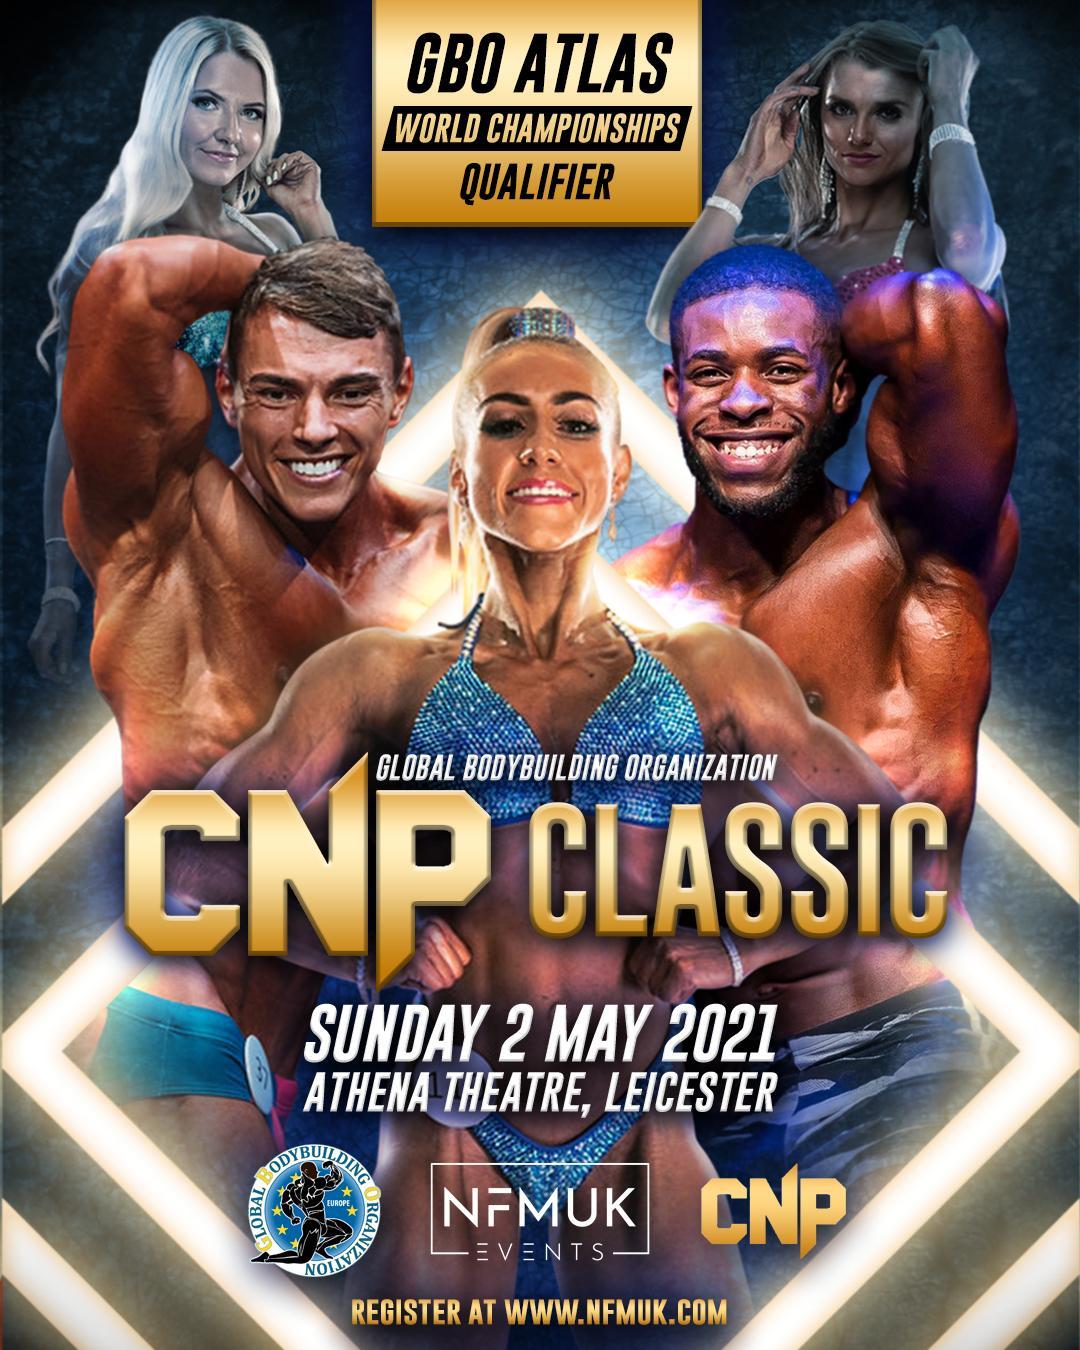 CNP Classic